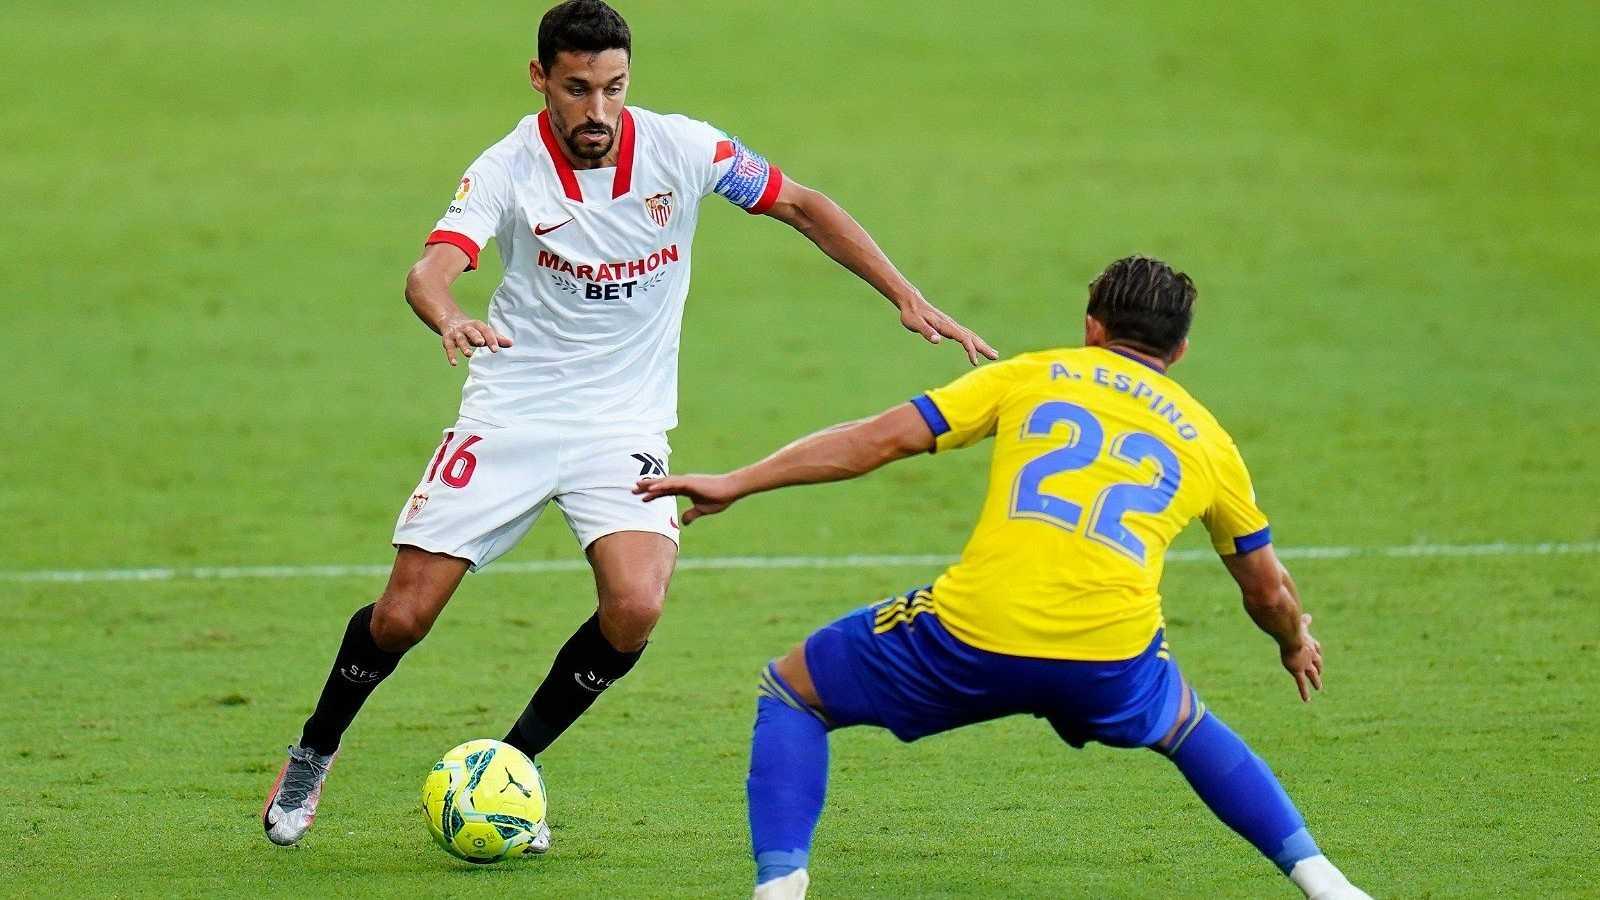 Jesús Navas, jugador del Sevilla FC, encara a Pacha Espino, del Cádiz